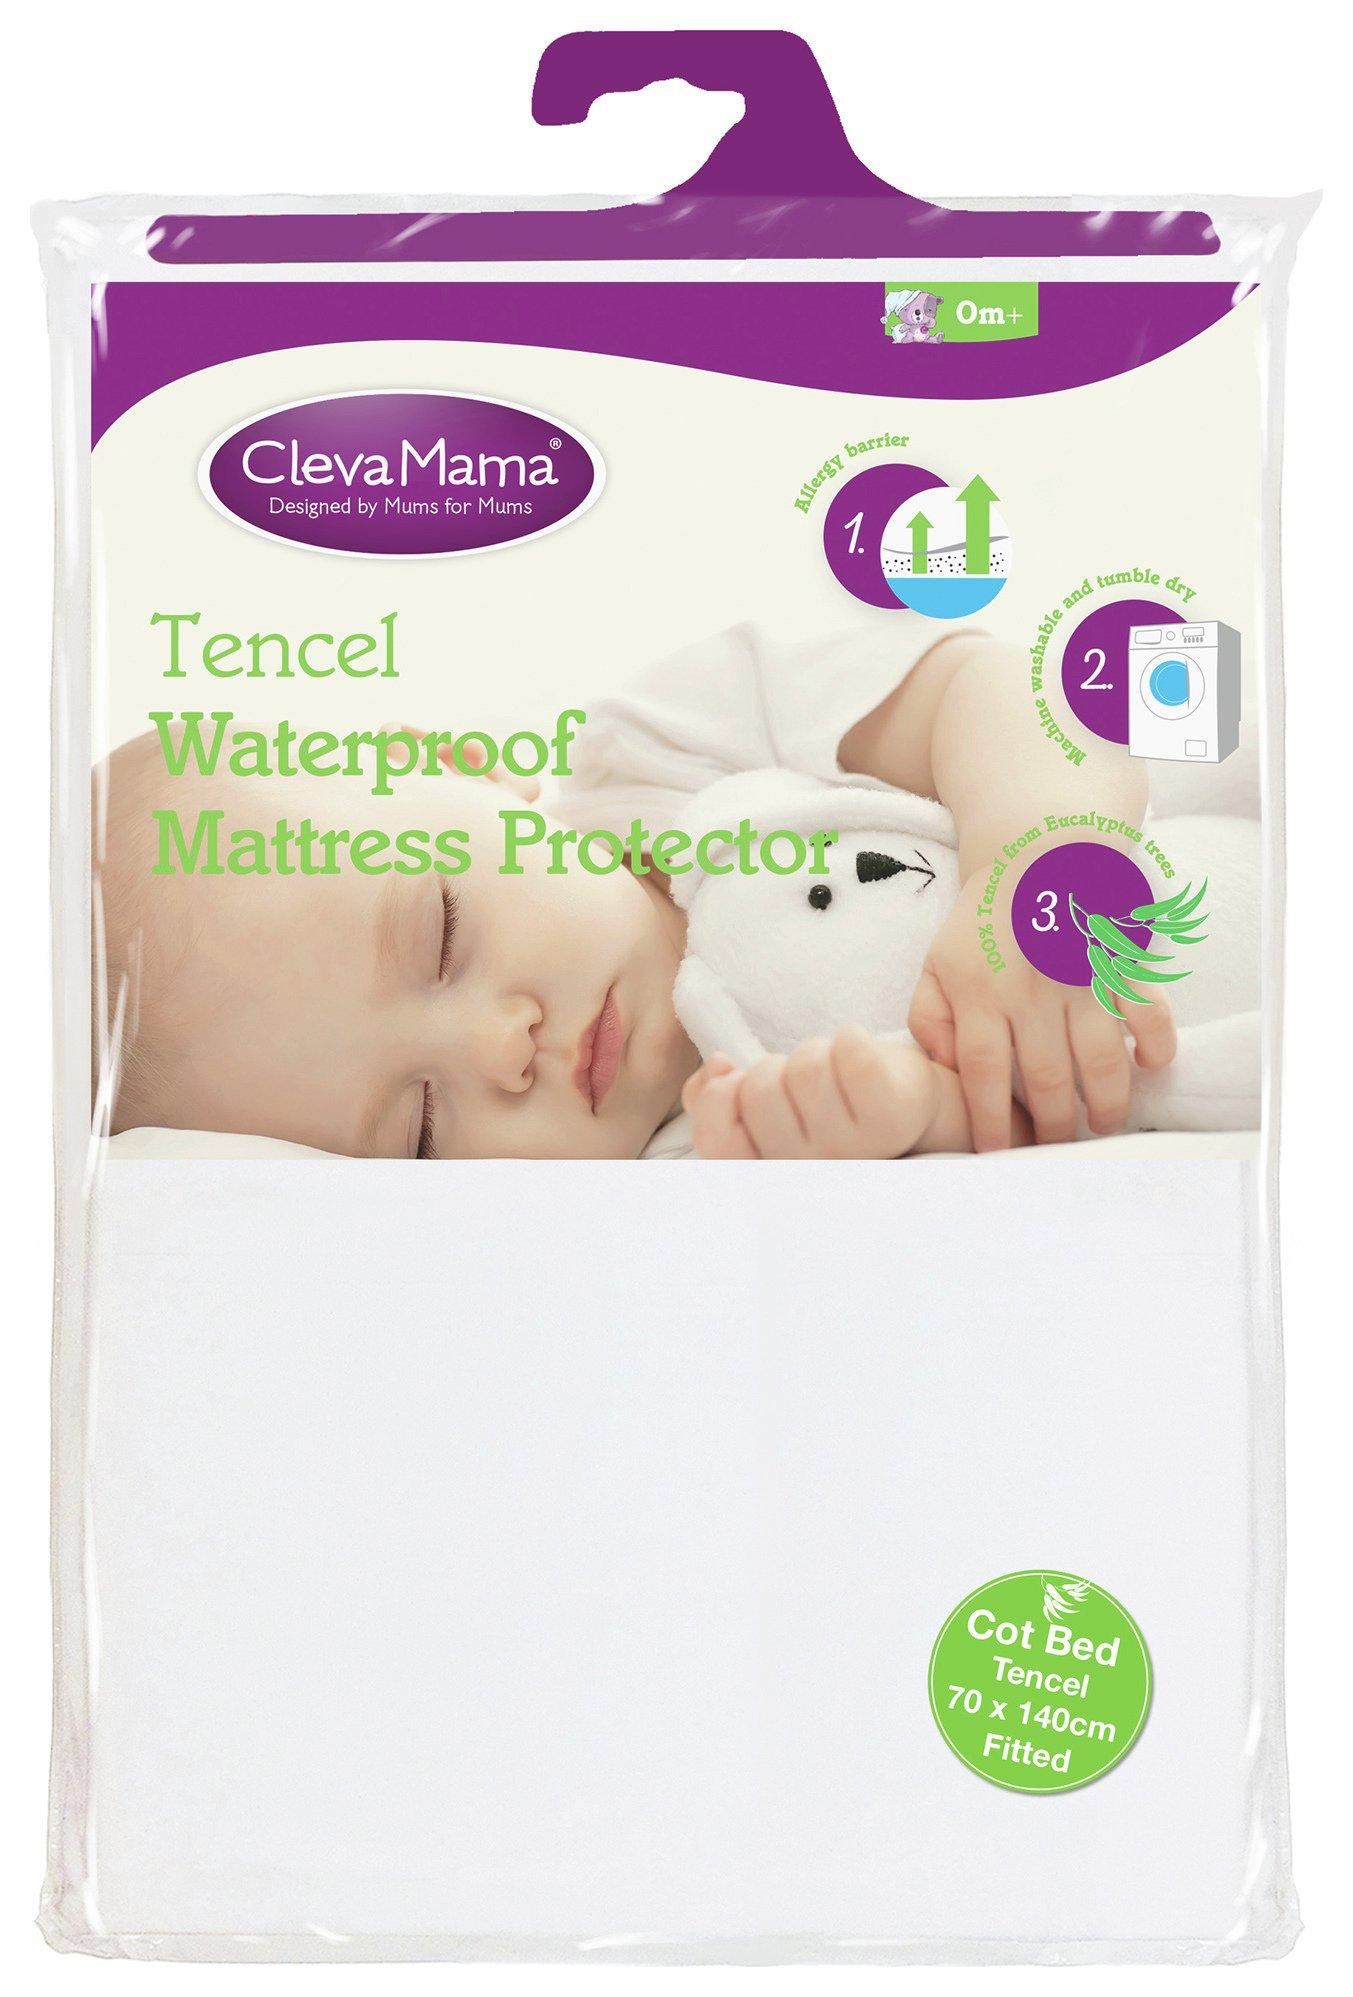 clevamama  tencel waterproof  mattress protector  90x40cm